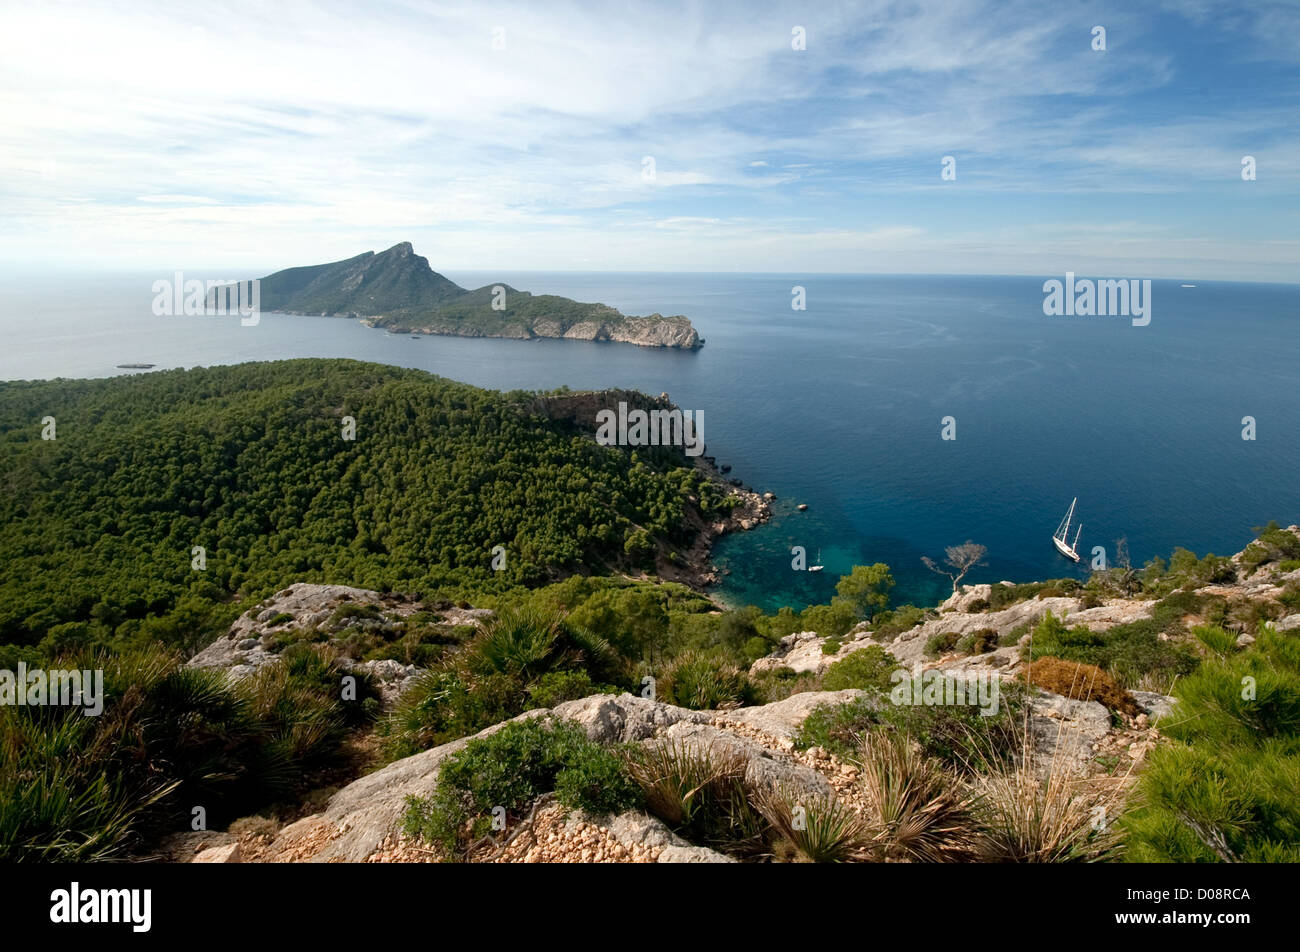 Sa Dragonera, uninhabited rocky island off Majorca, pedestrian walkways, Balearic Islands, Spain, Europe - Stock Image